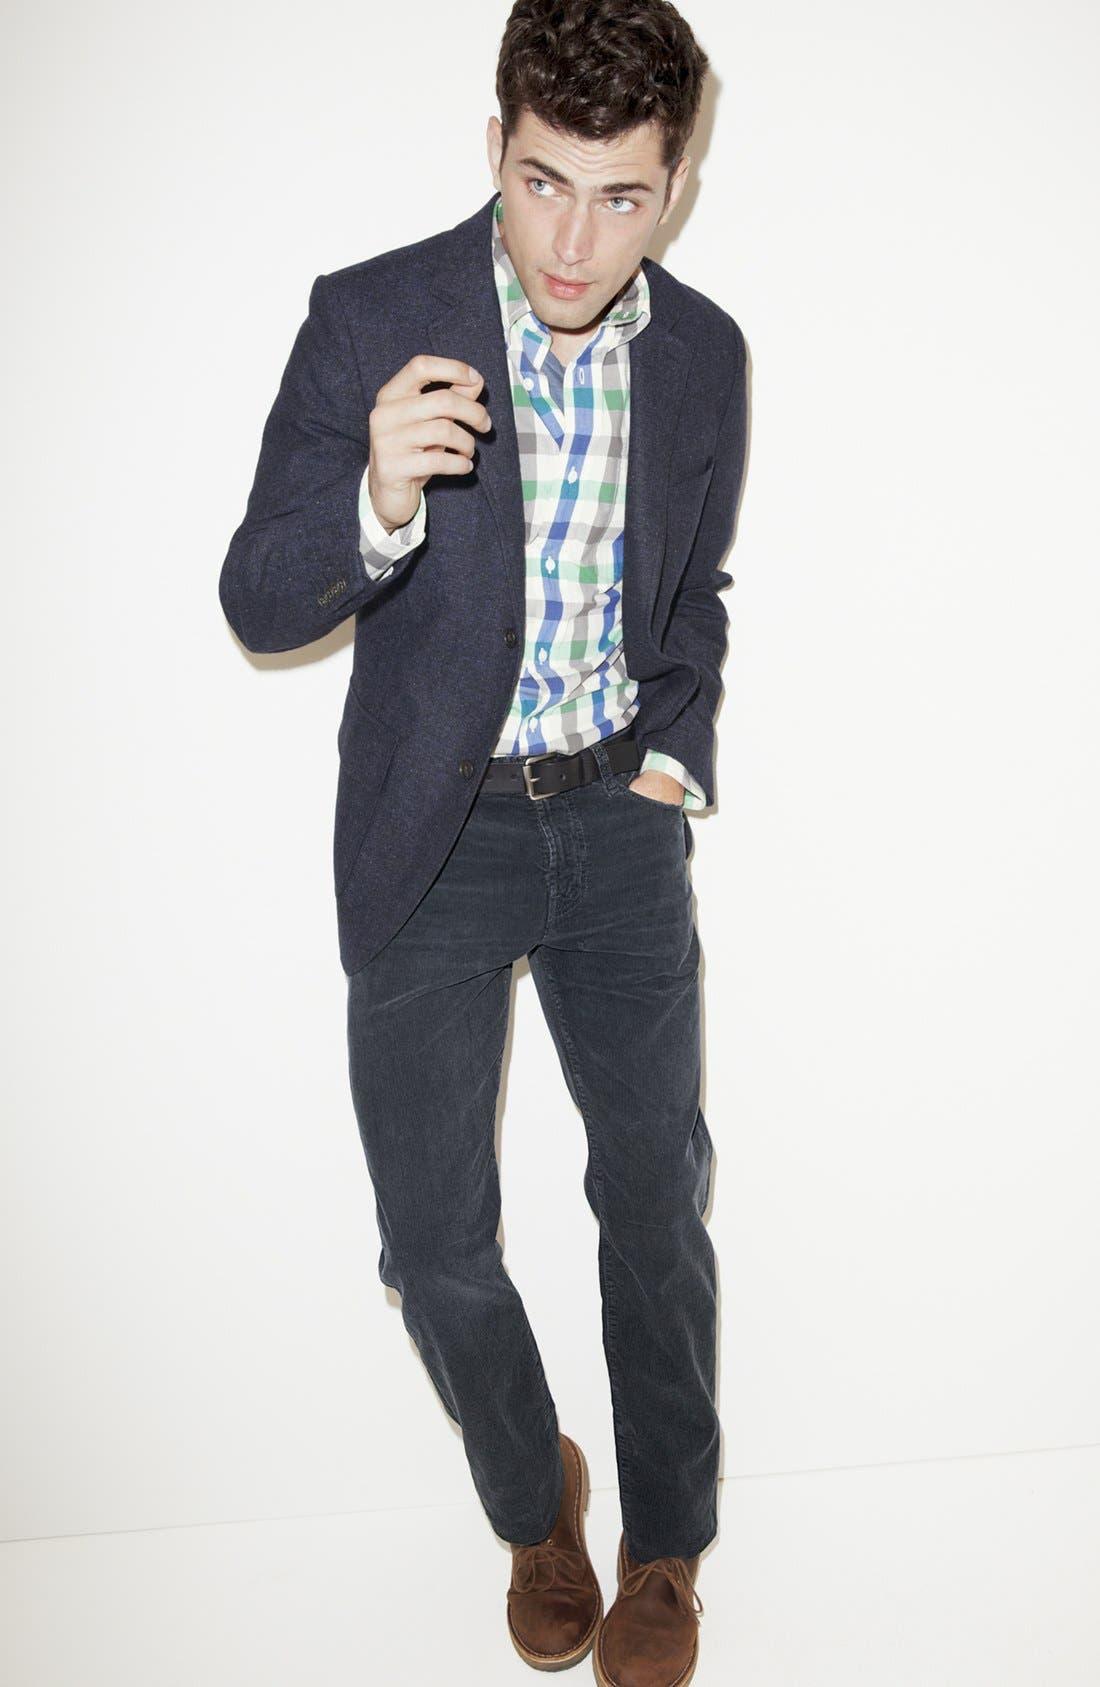 Main Image - Jack Spade Blazer, Sport Shirt, Save Khaki Crewneck T-Shirt & AG Jeans Straight Leg Pants